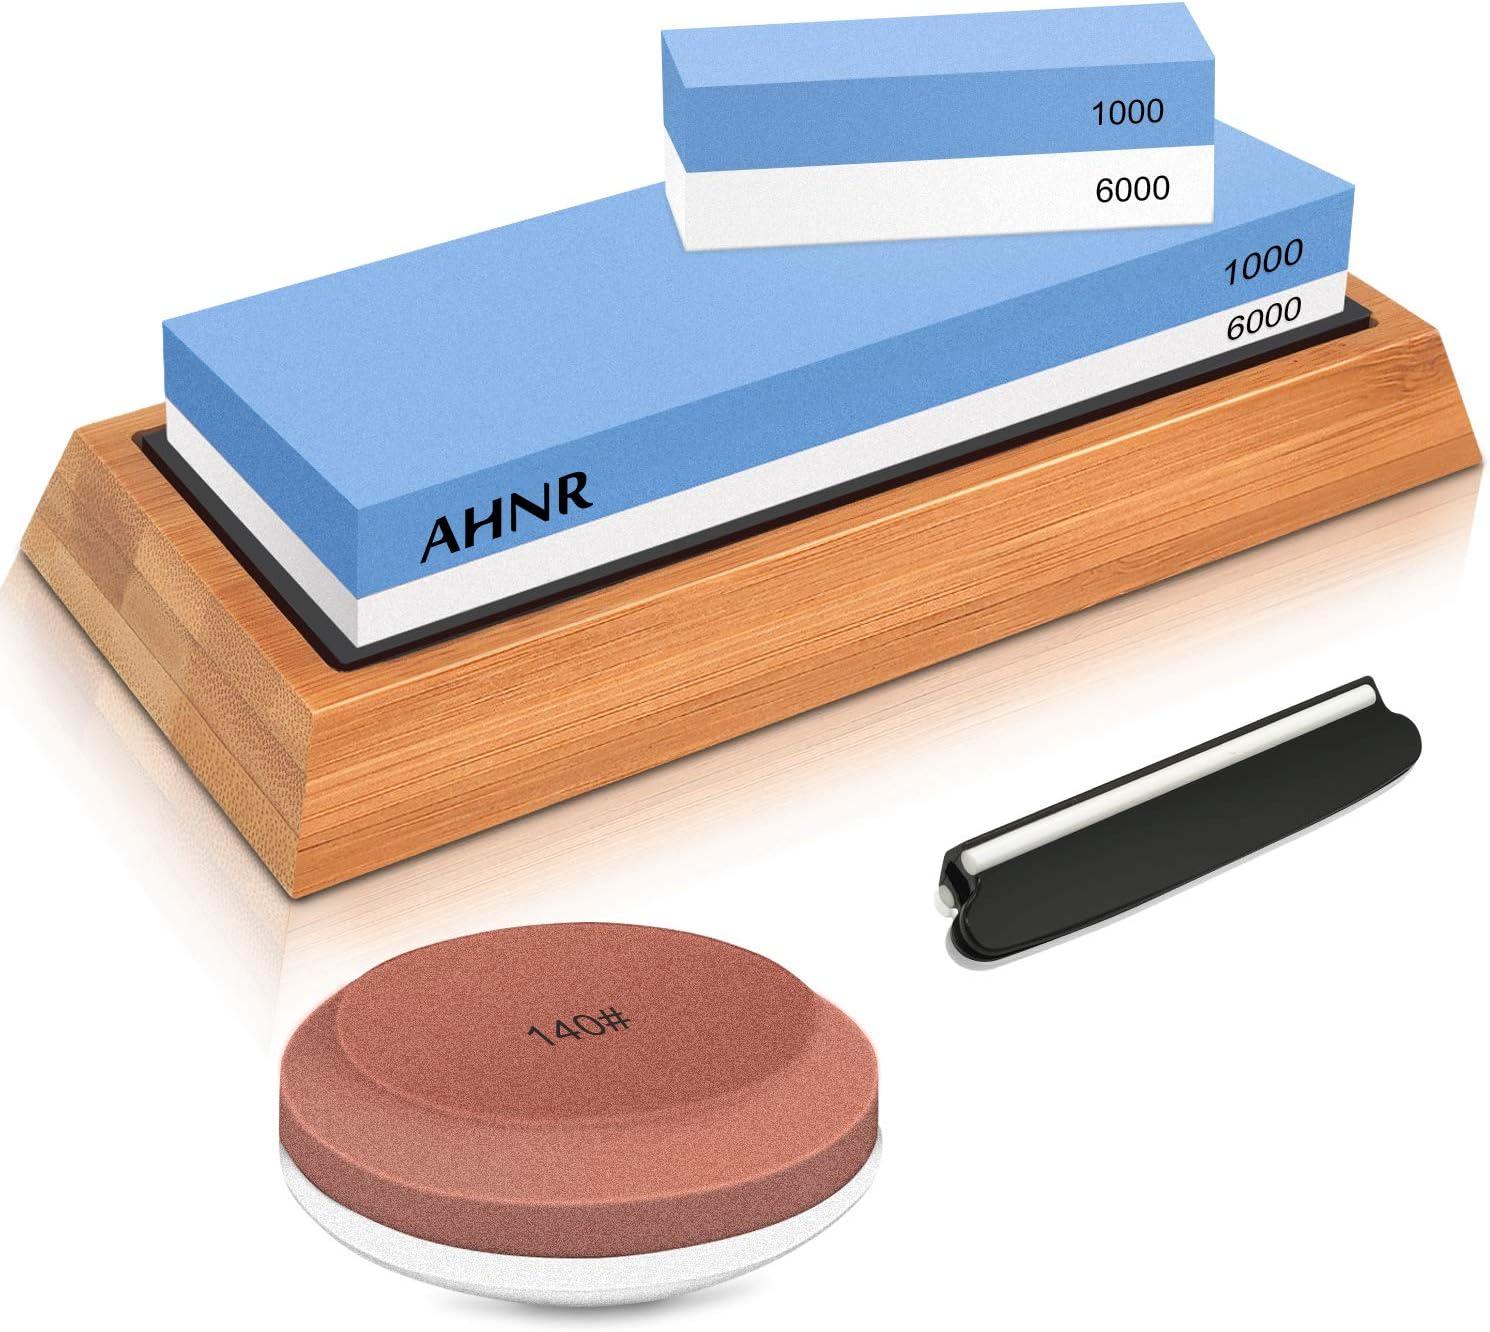 AHNR Knife Sharpening Stone Set $10.40 Coupon